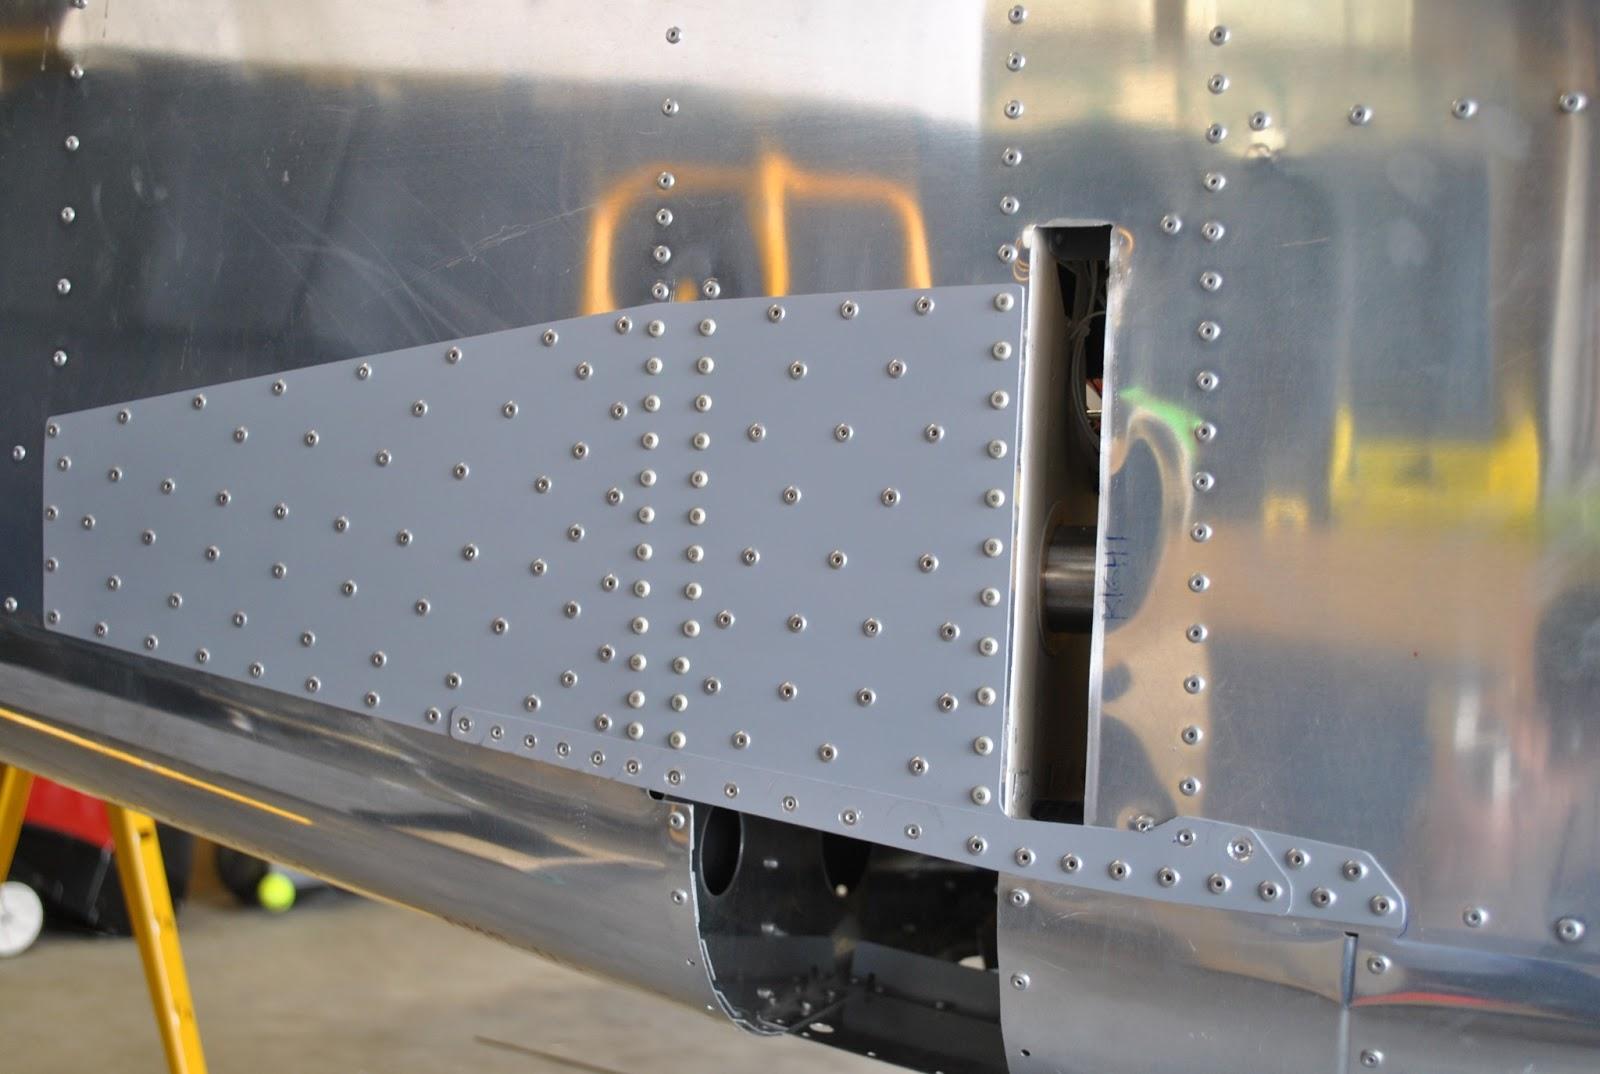 RV-12 Builder in Sandy, UT: Rivet Side Skin Doublers